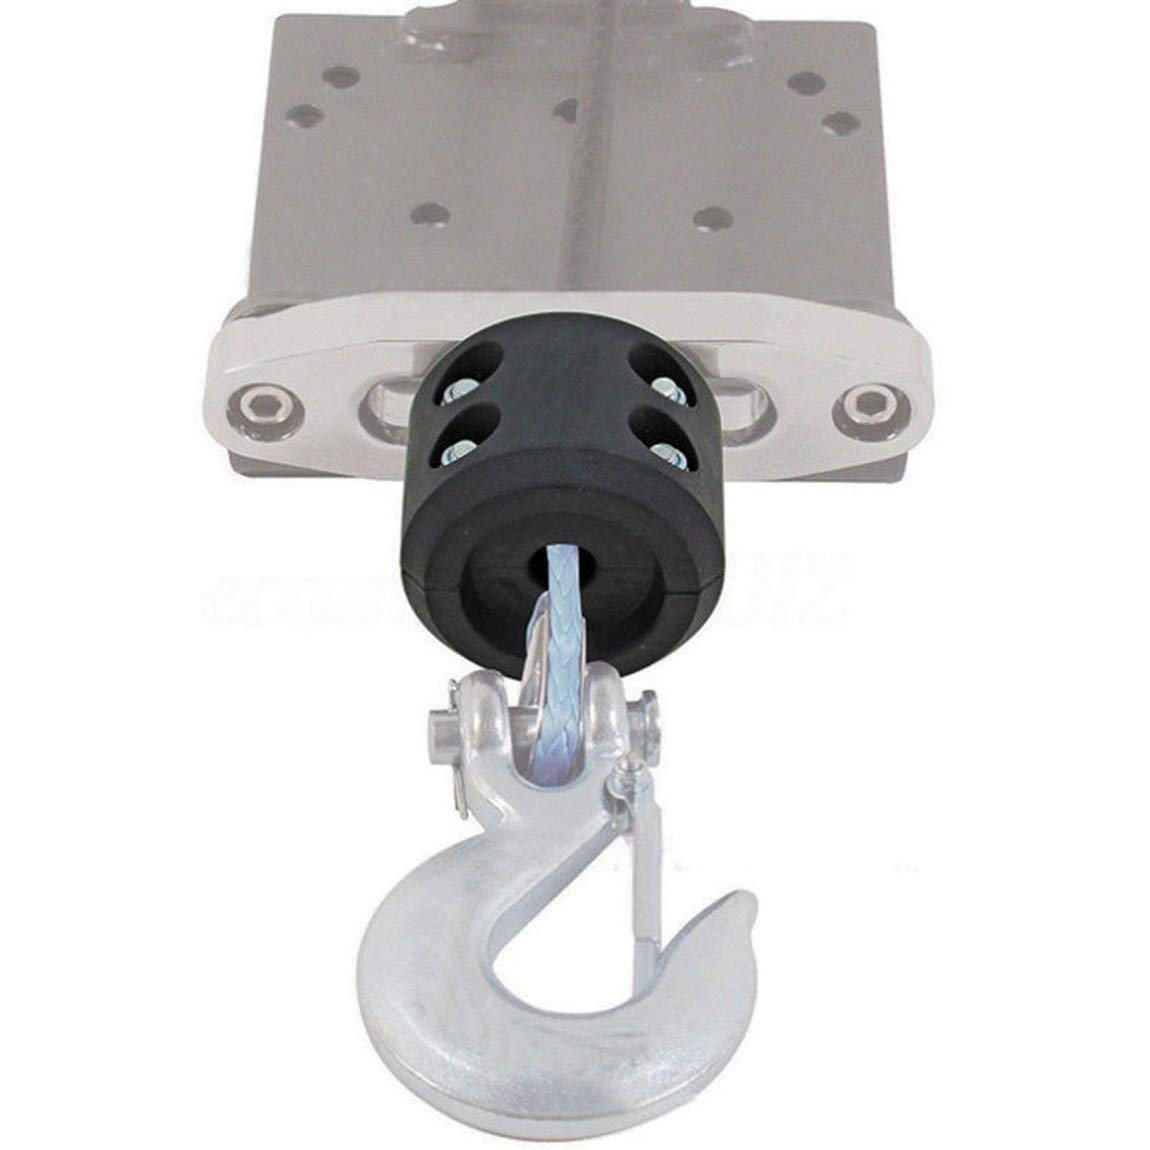 COLOR: Azul ATV UTV Winch Cable Hook Mount Stop Stopper Coj/ín de goma Negro Winch Cable Hook Stopper TAMA/ÑO: 135mmx95mm